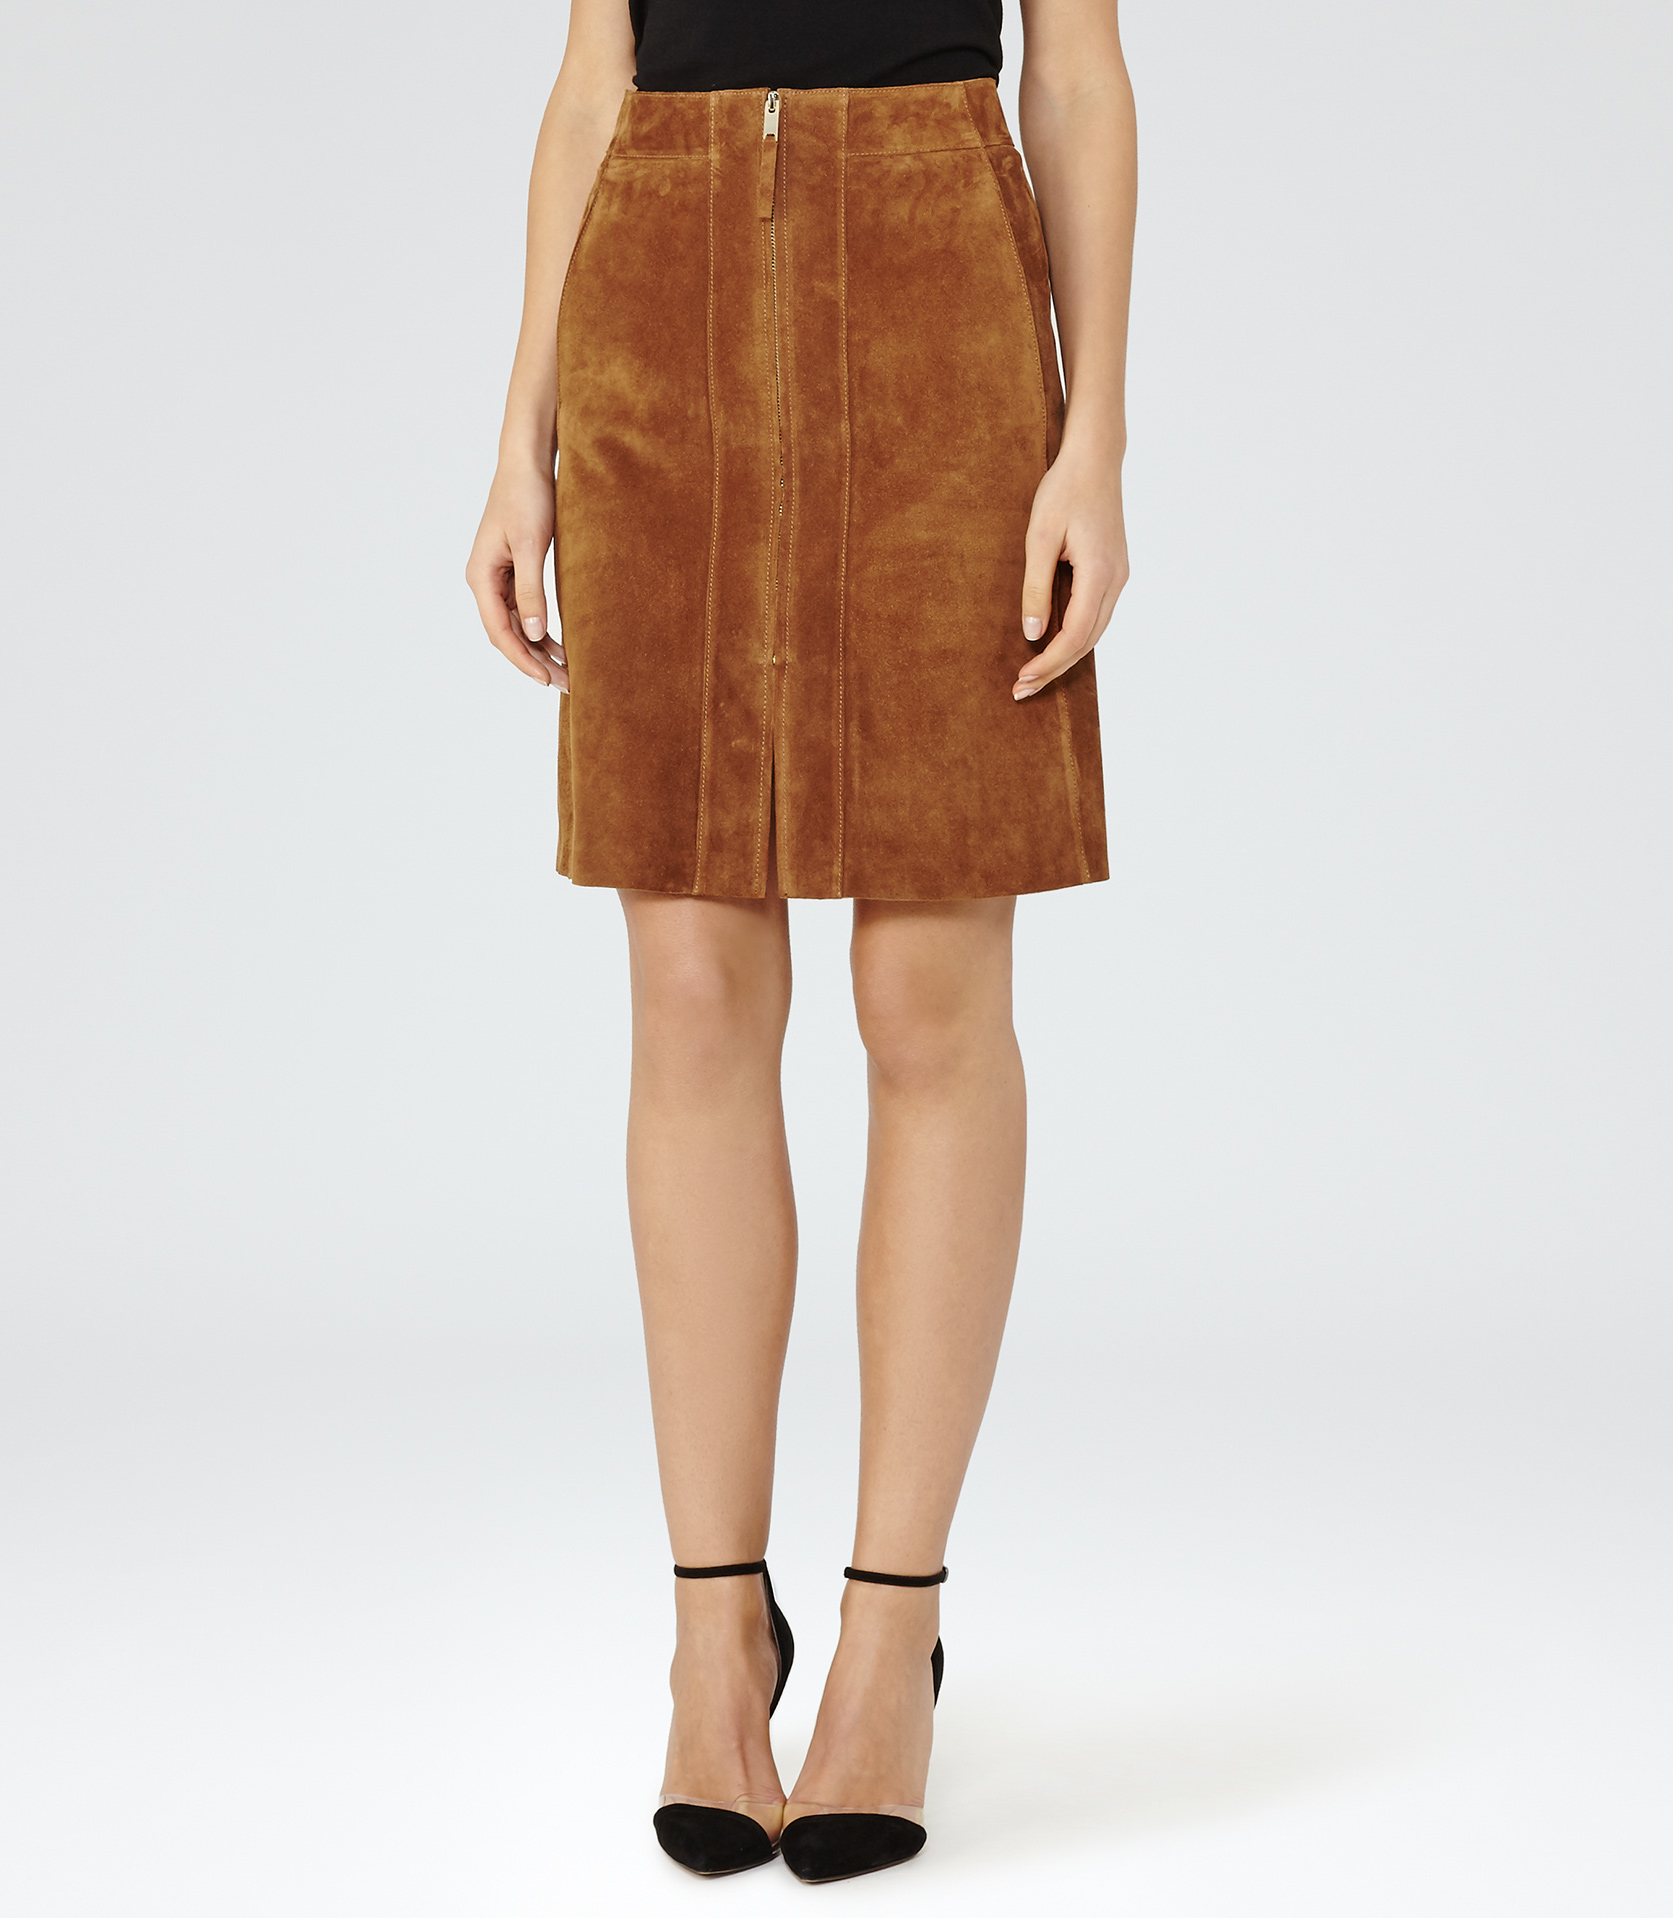 Reiss Joss Suede A-line Skirt in Brown | Lyst